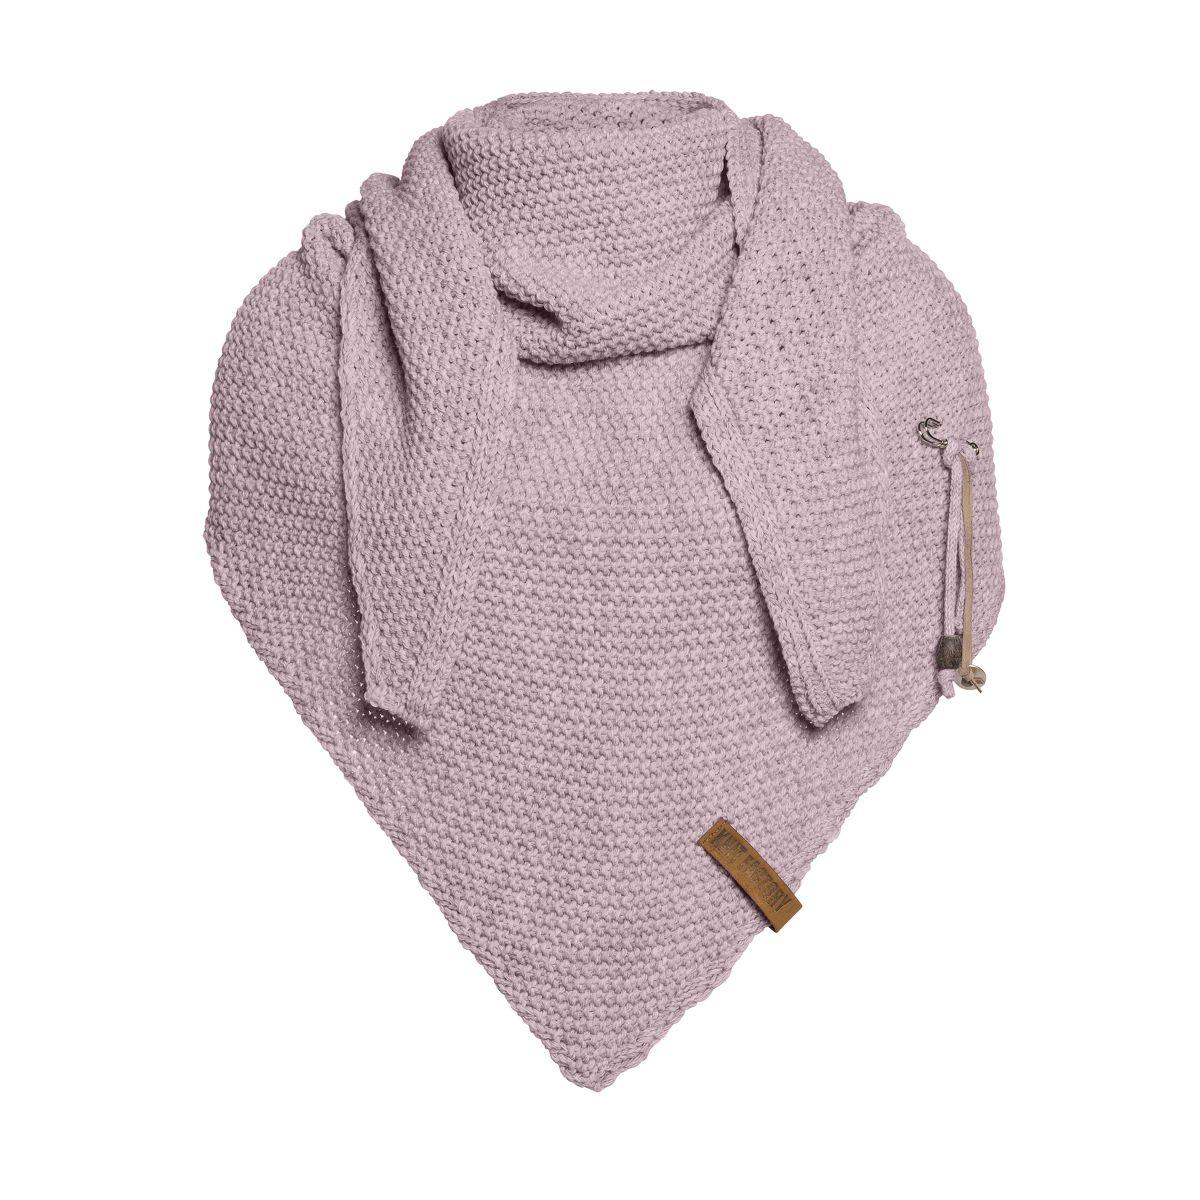 knit factory 1206034 coco omslagdoek mauve 1